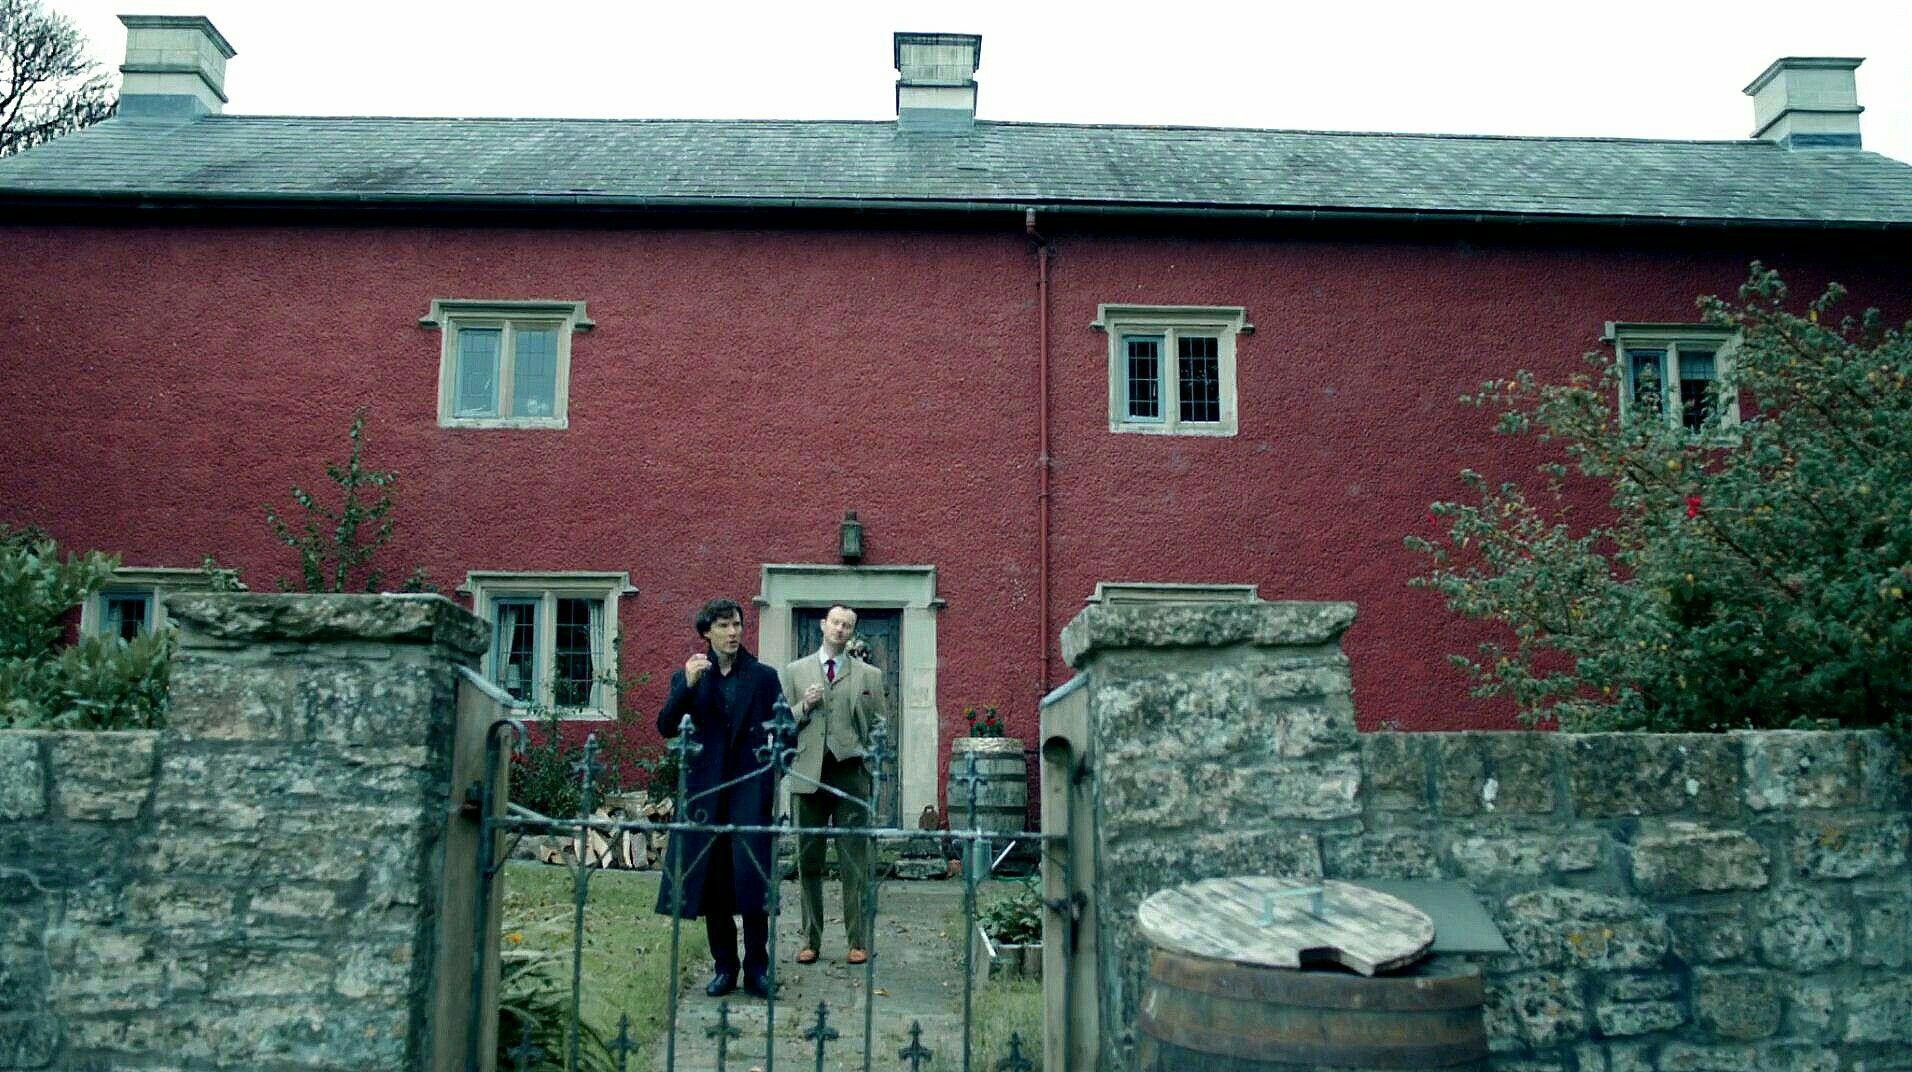 Holmes Parents House Sherlock Sherlock Bbc Holmes